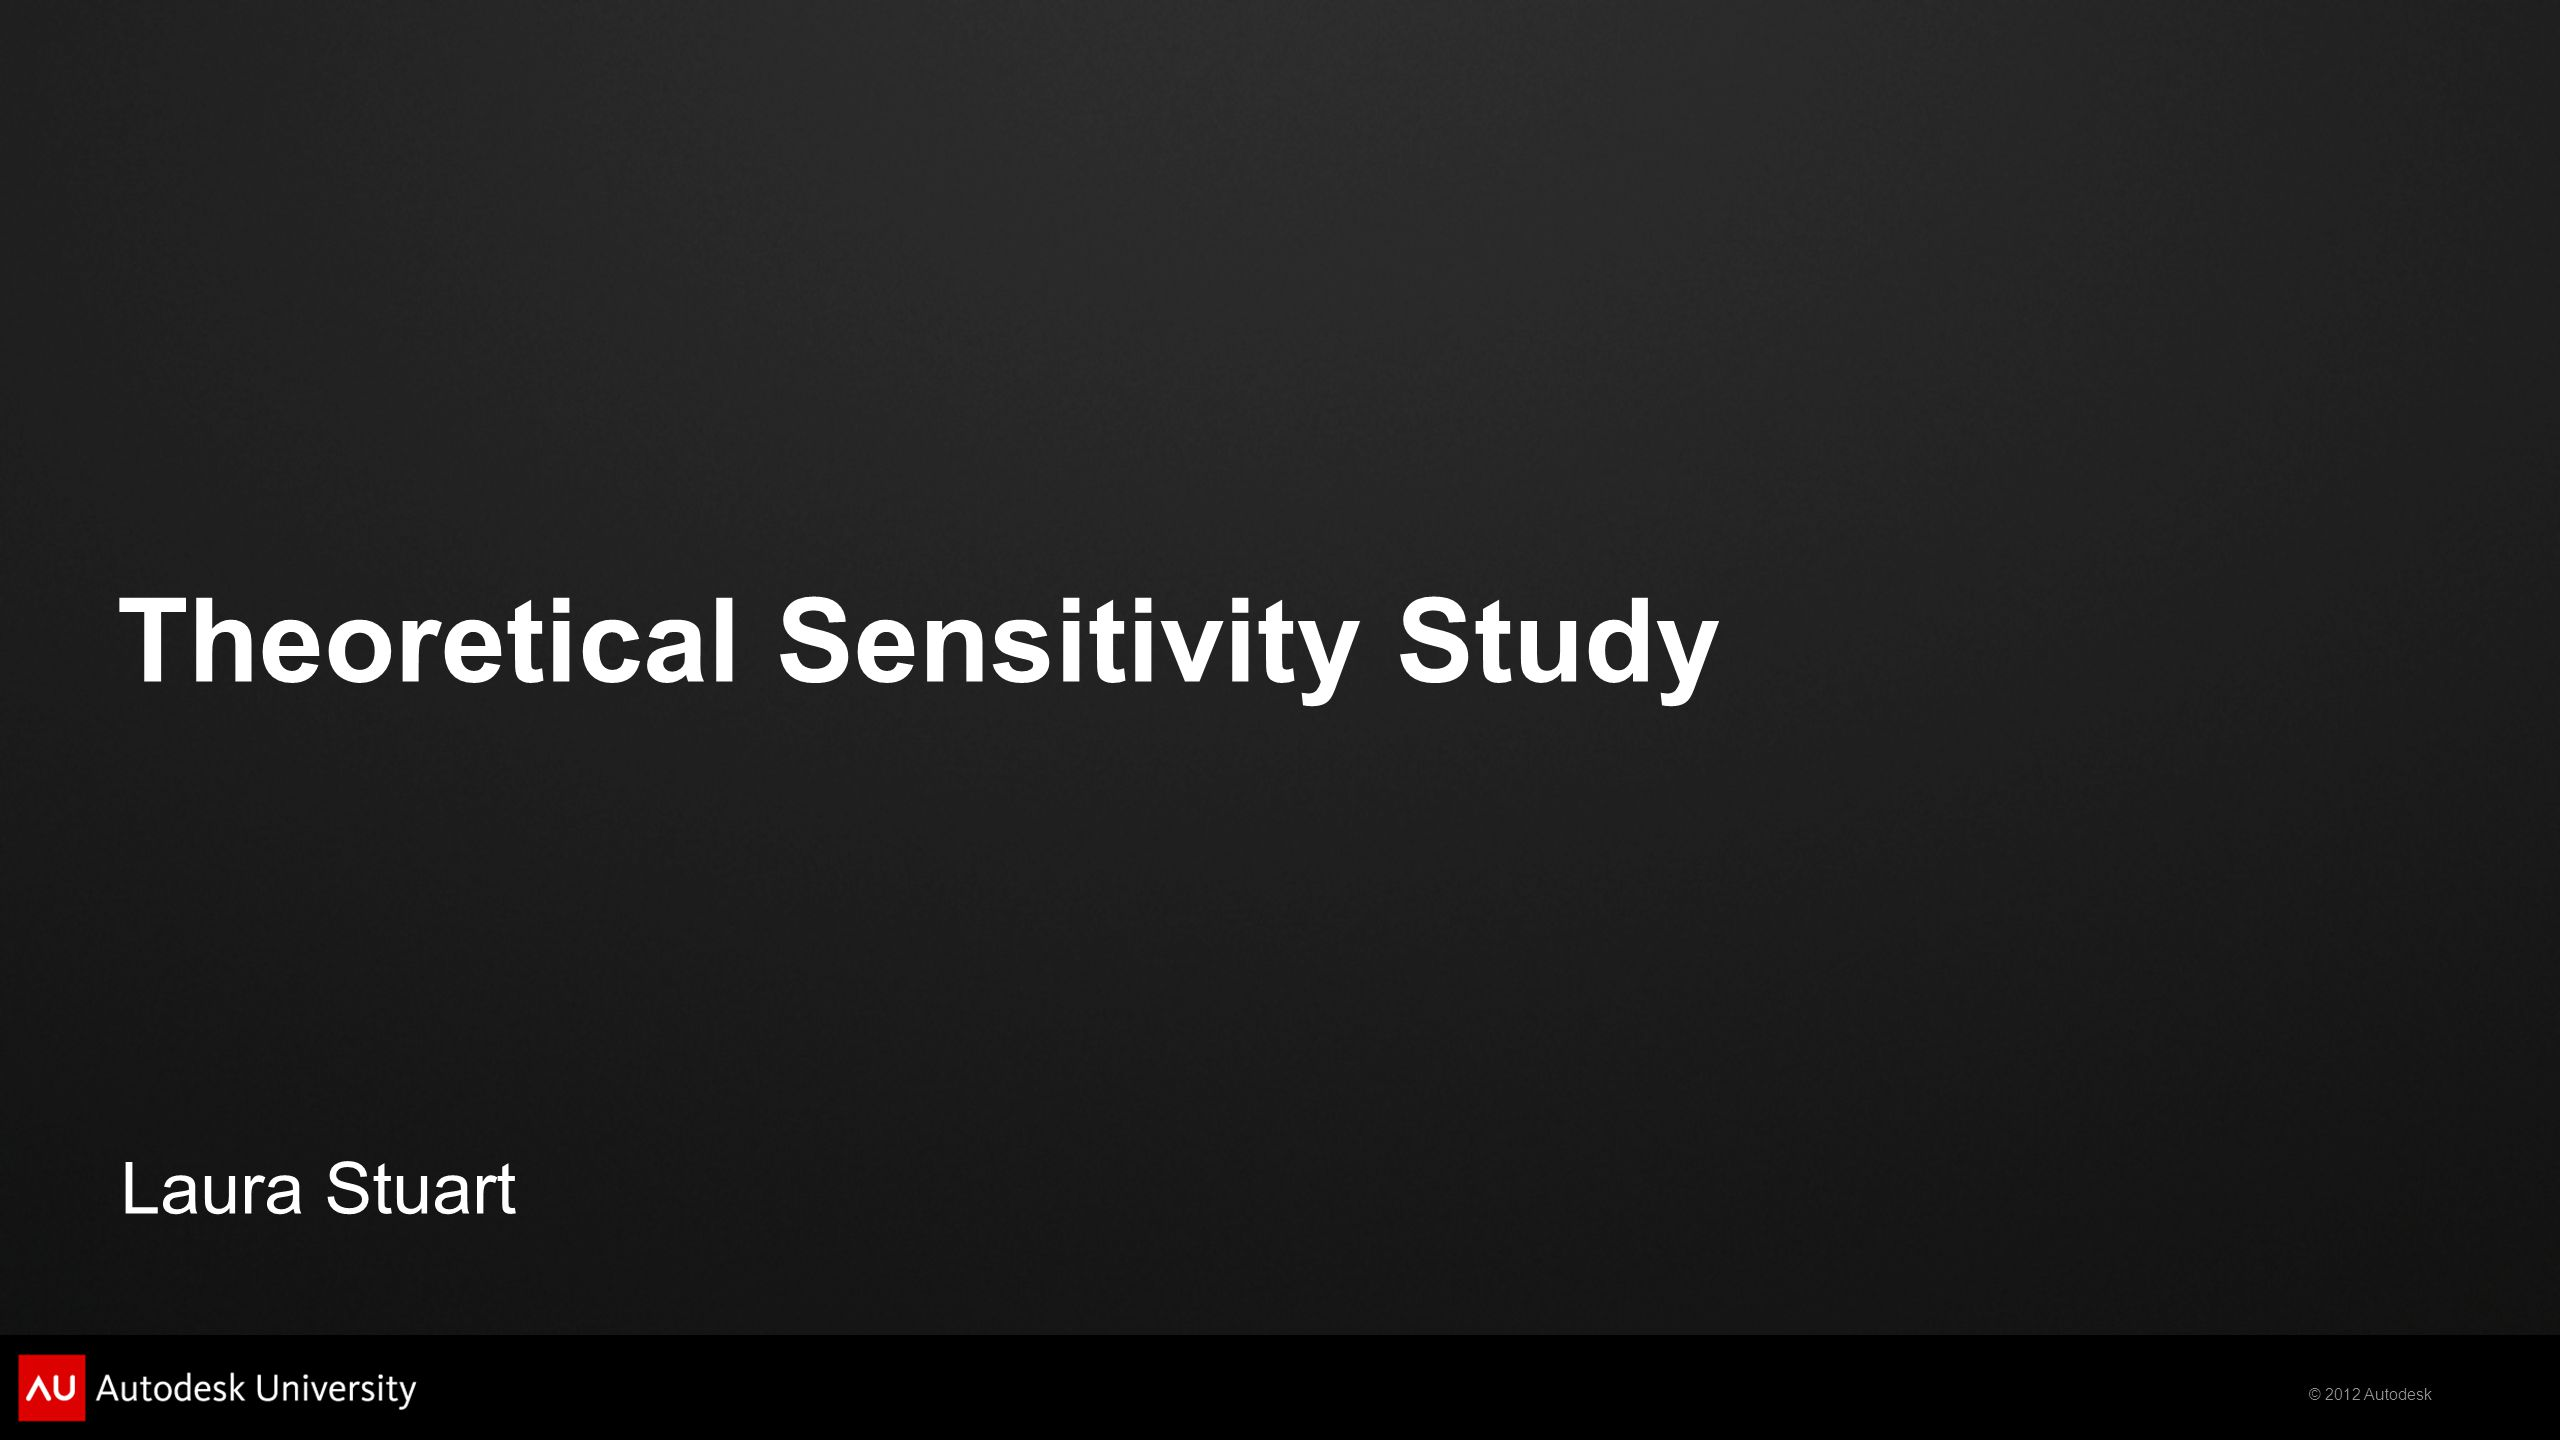 Theoretical Sensitivity Study